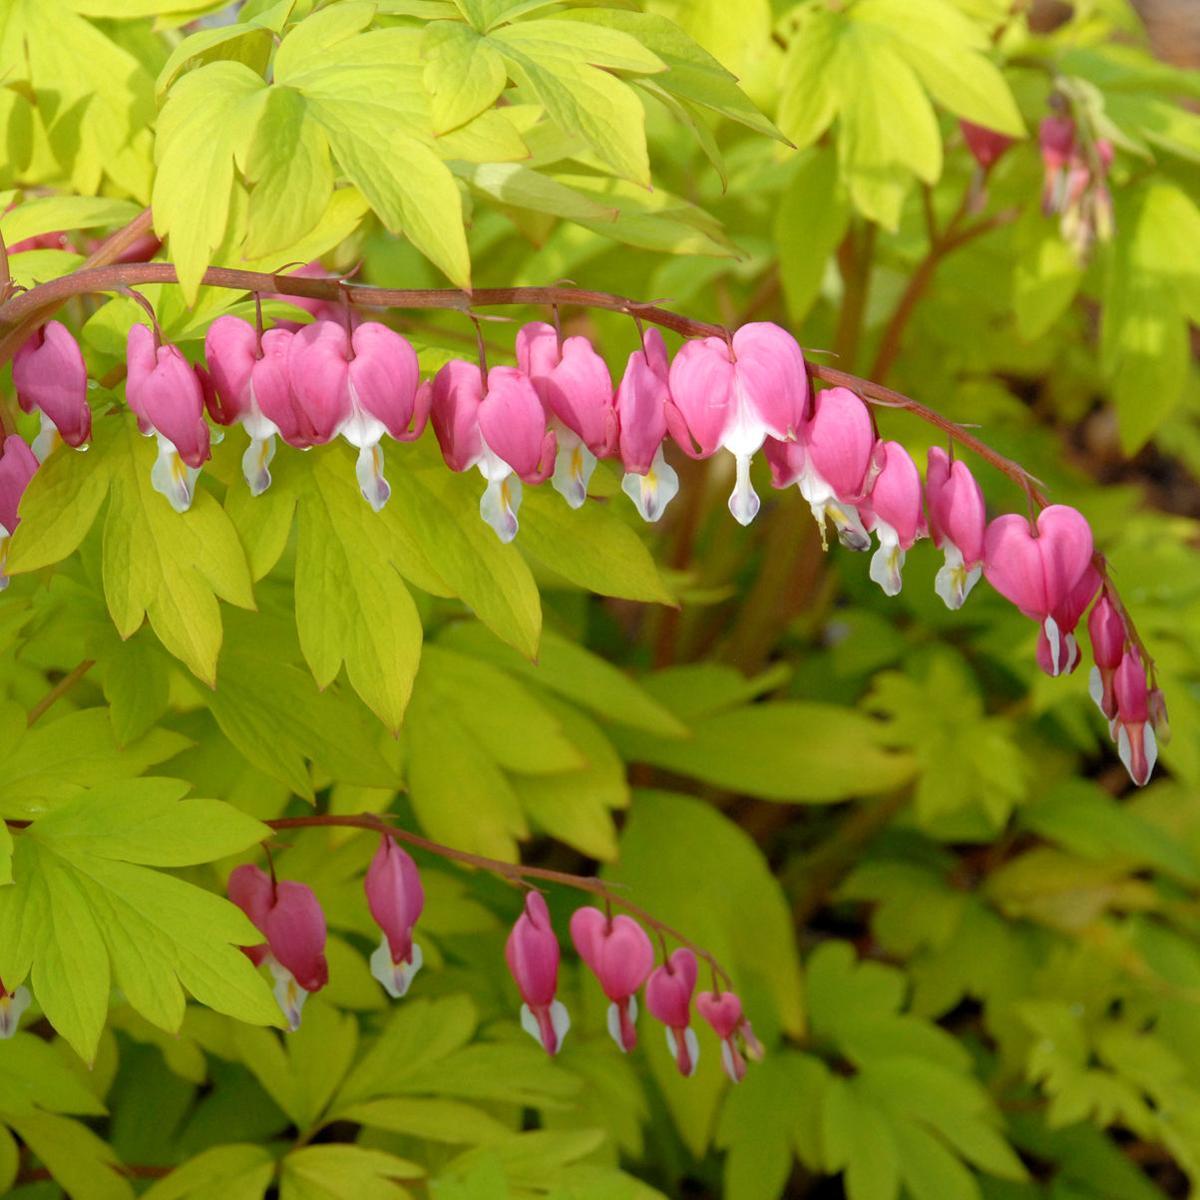 Riggenbach Odd Shaped Flowers Delight Living Omaha